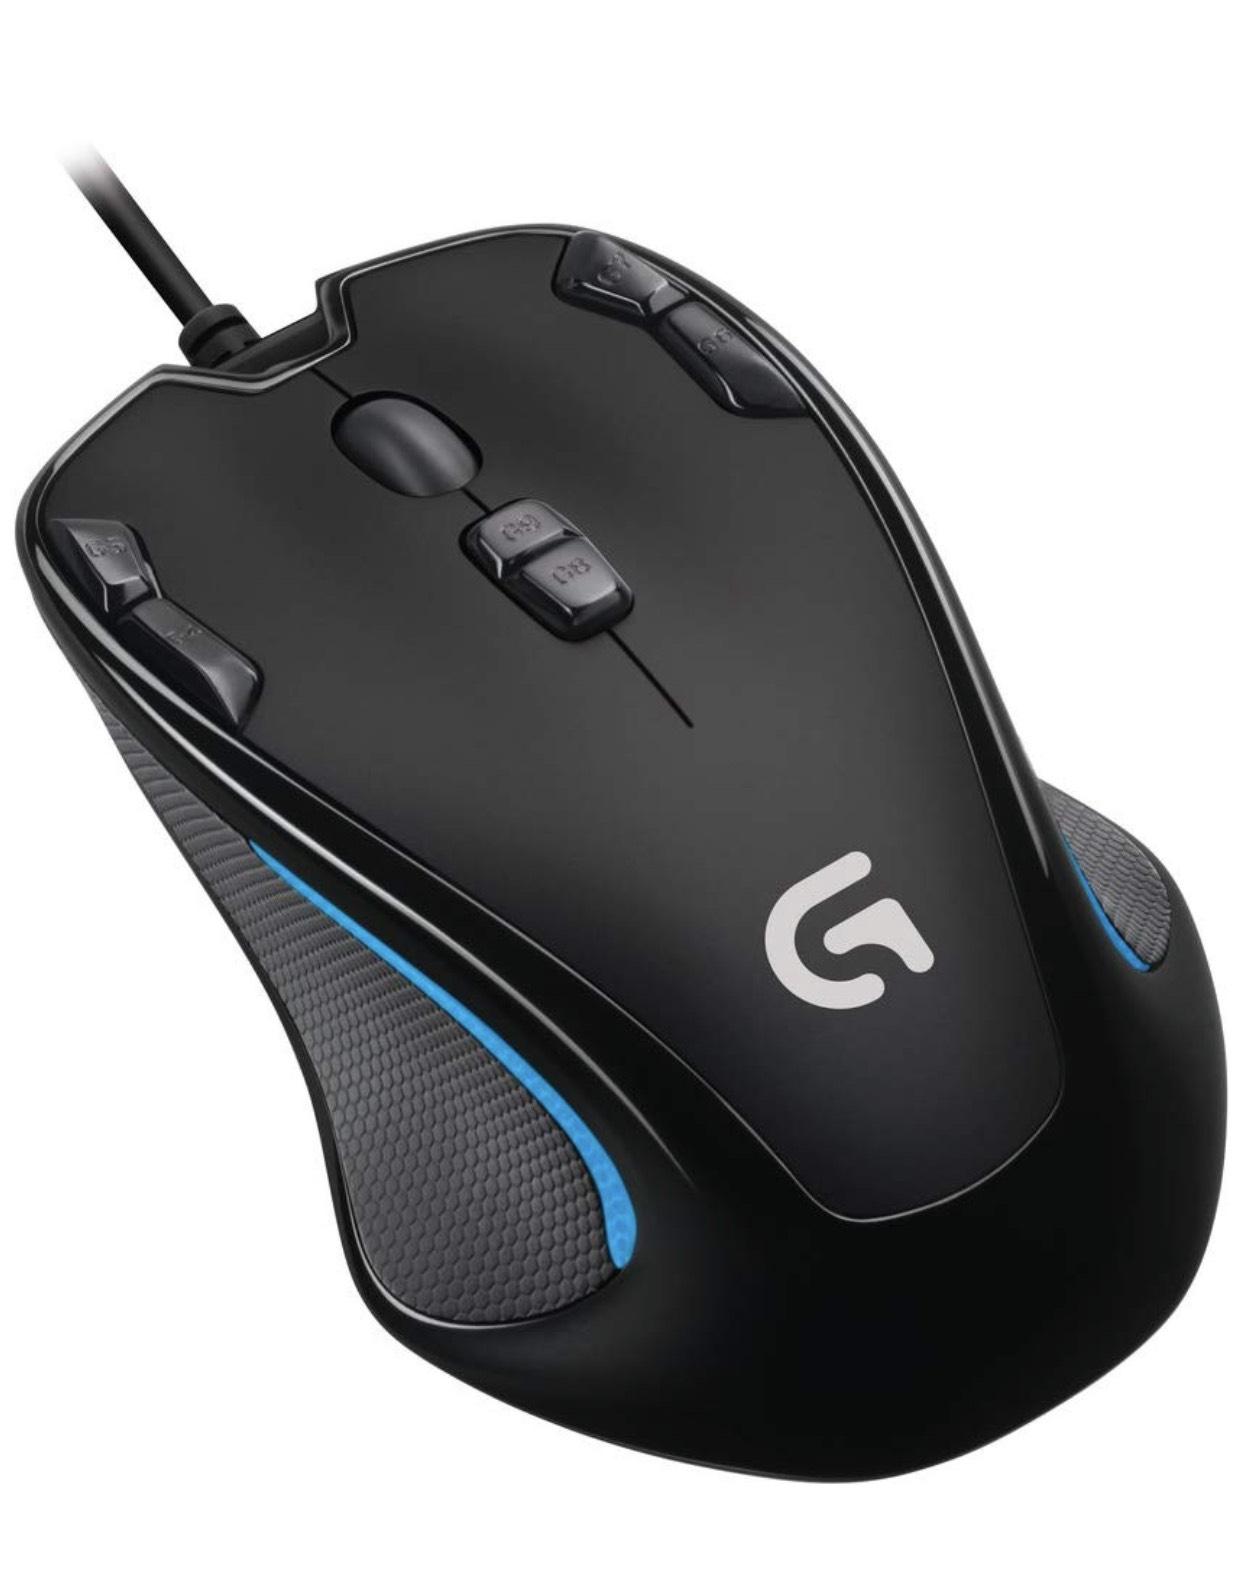 Logitech G300s Optical Gaming Maus